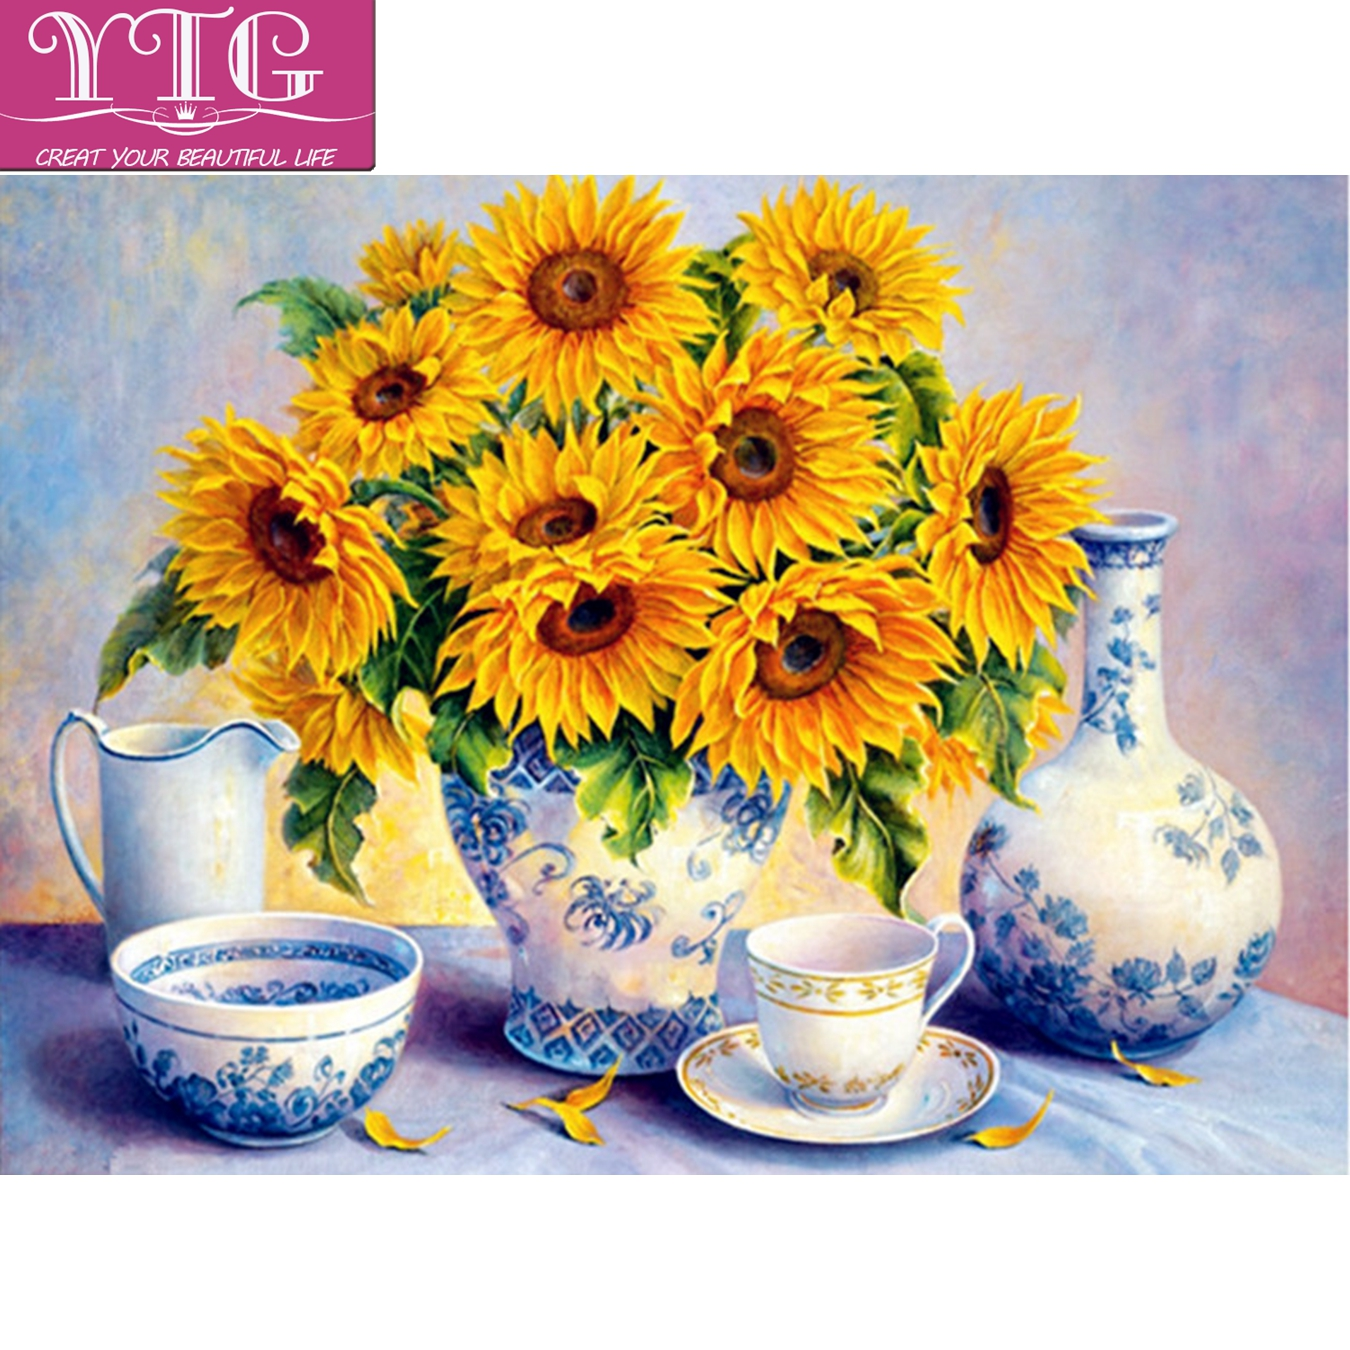 Full,Diamond Painting,Sunflower,Diamond Embroidery,Cross Stitch,5D,Wall,Sticker,Round,Rhinestone,Mosaic,Kits,DIY,Home Decor,Gift